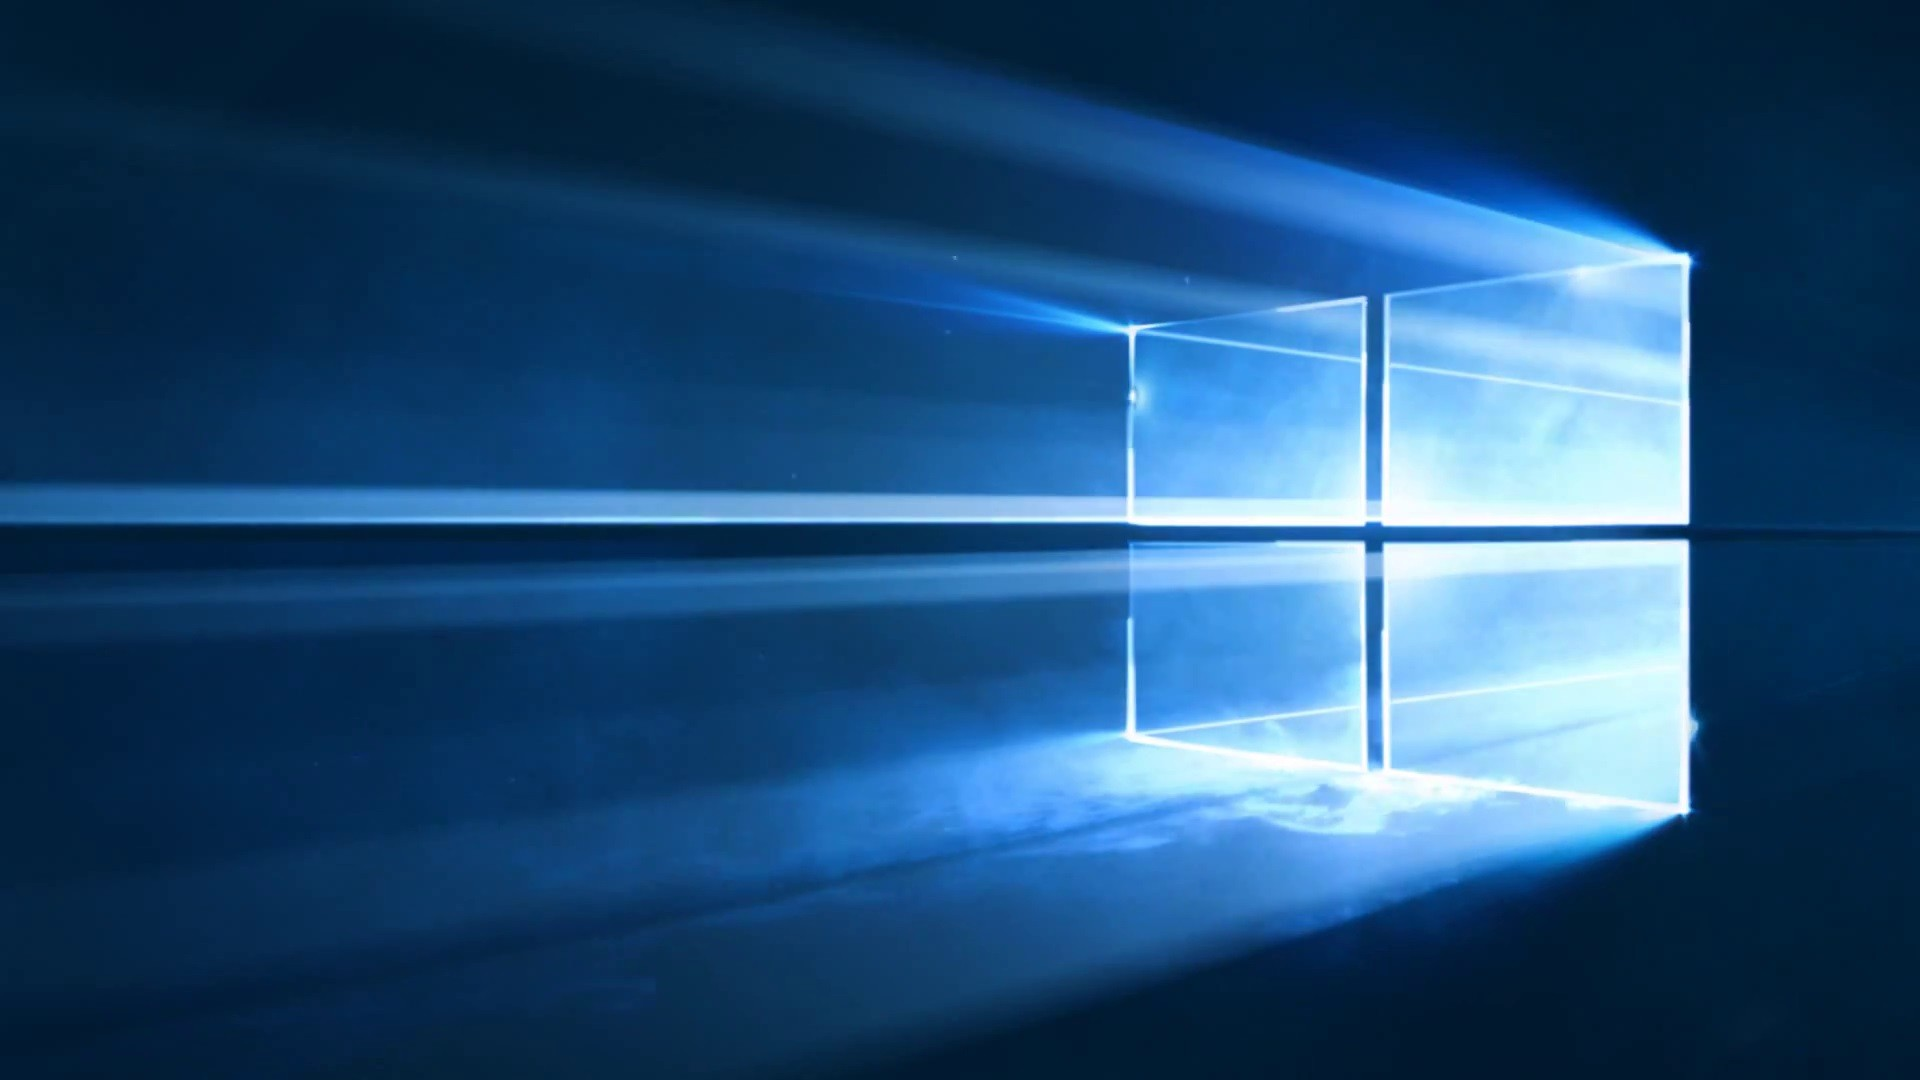 6 segredos sobre o Windows 10 que ninguém comenta Error-al-actualizar-windows-10-696x522